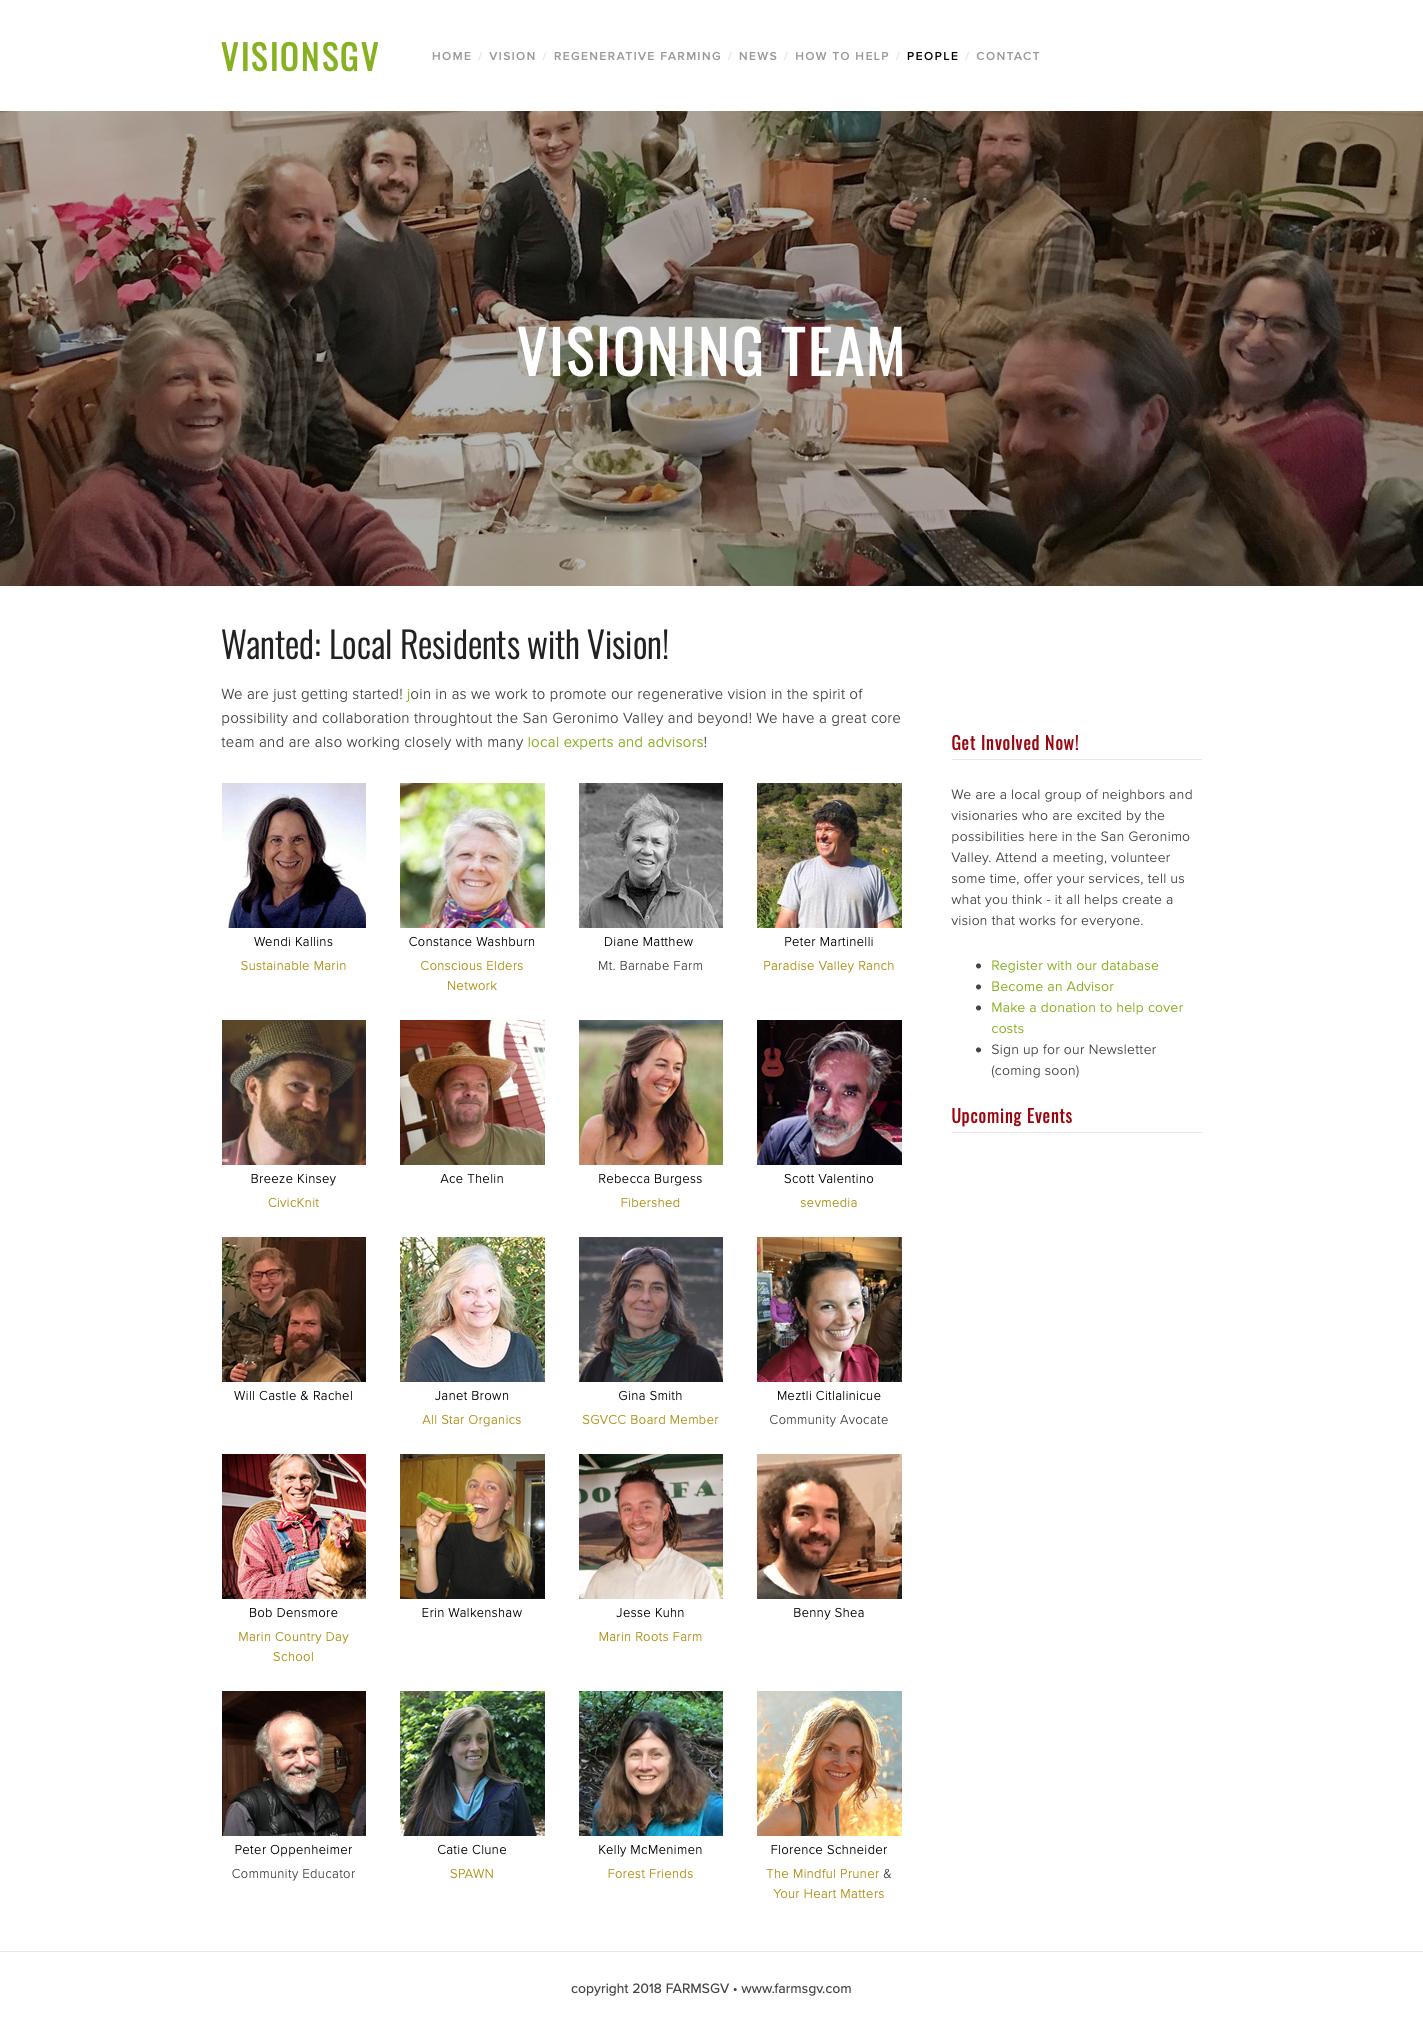 Visioning Team — VisionSGV.png